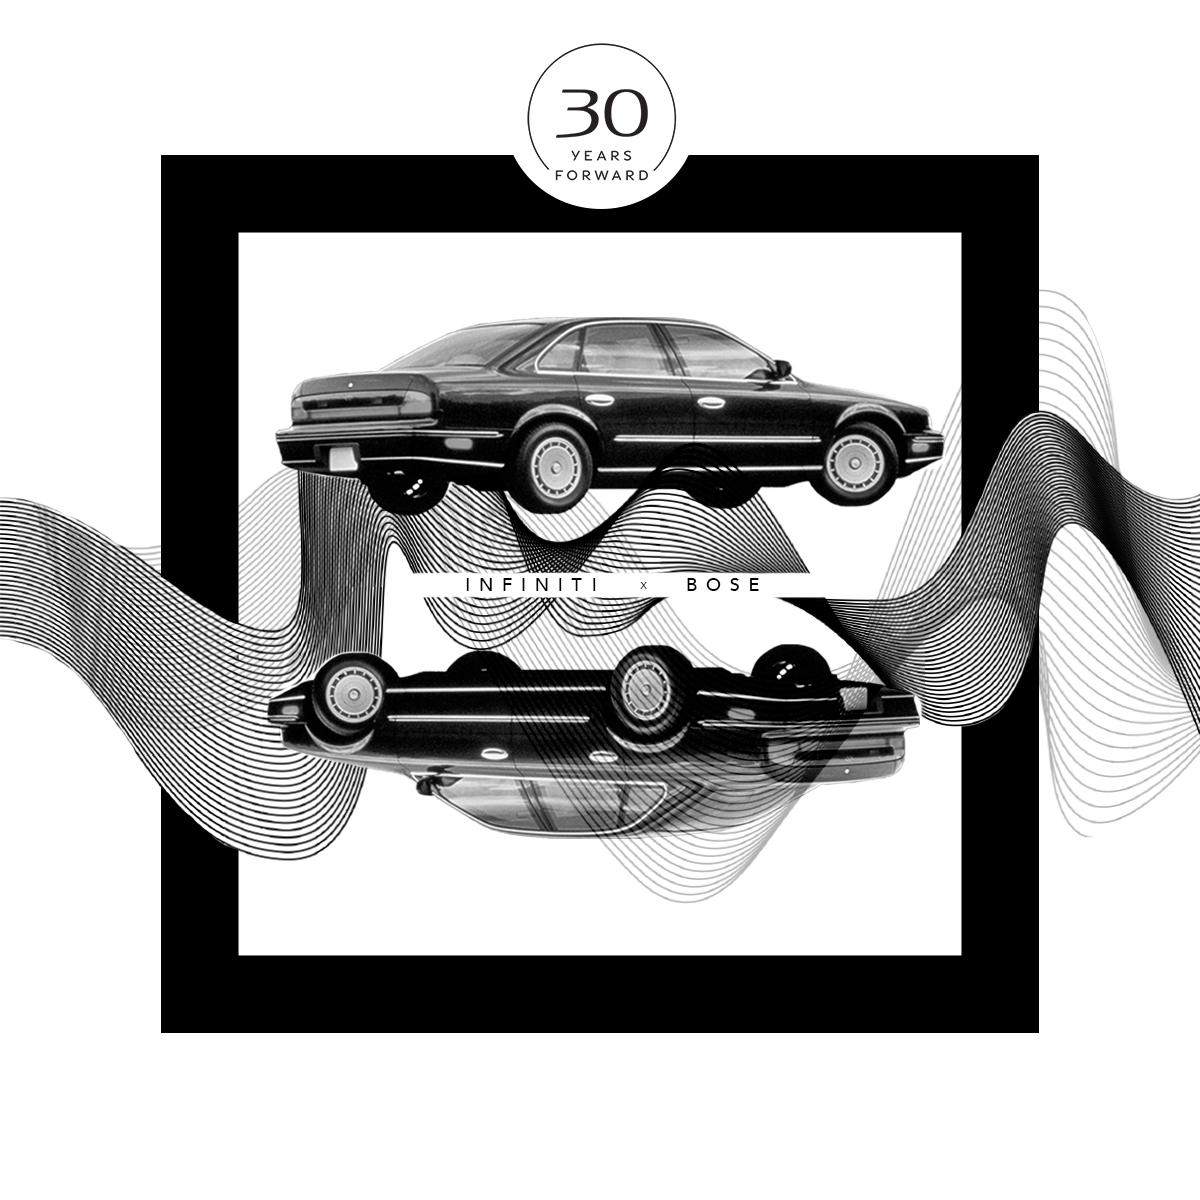 INFINITI и Bose 30 лет